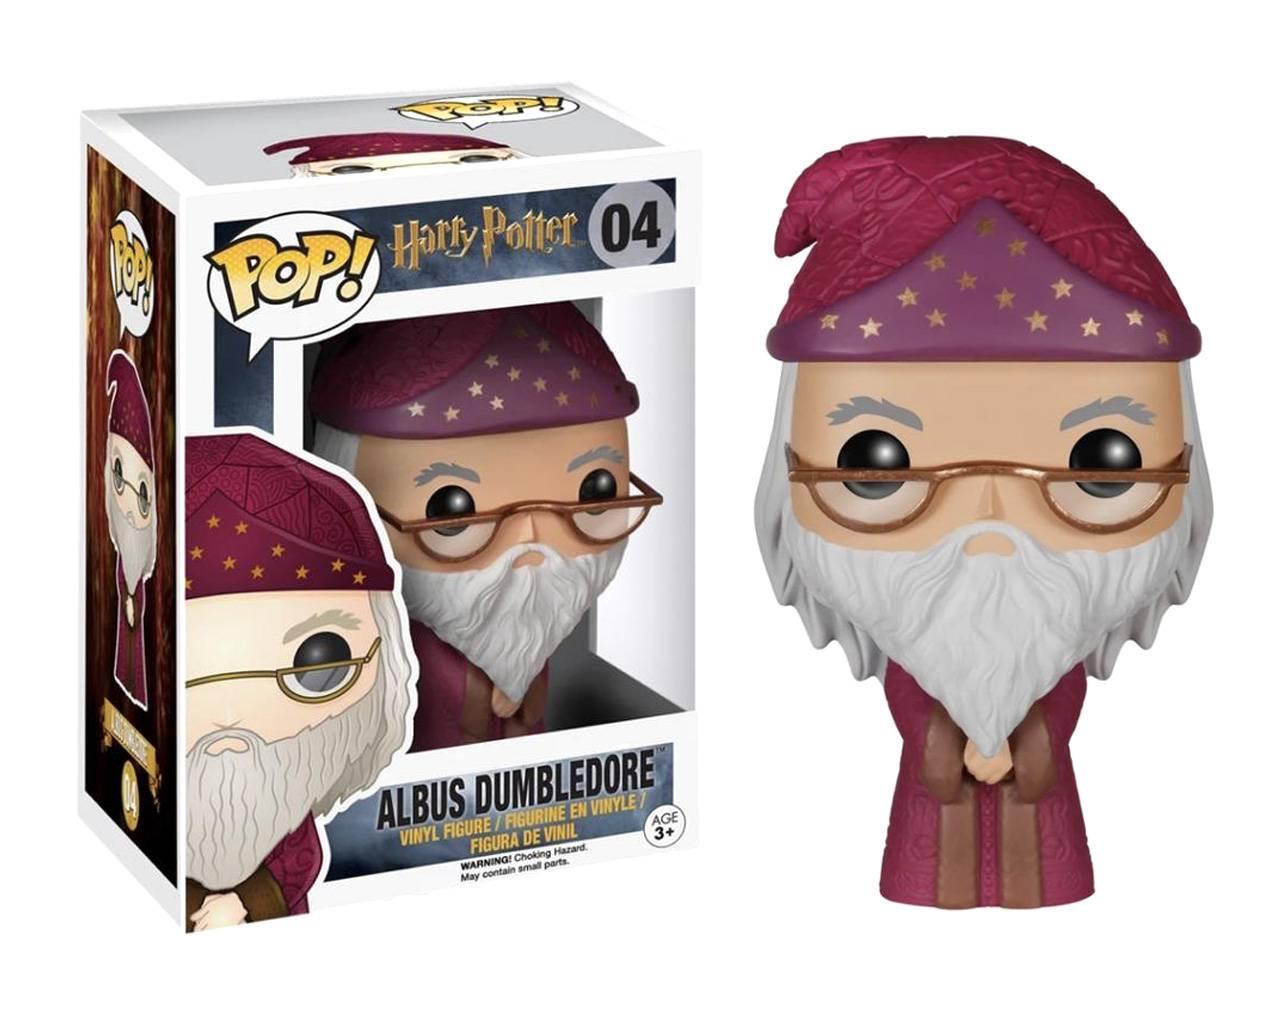 Albus Dumbledore Pop! Vinyl